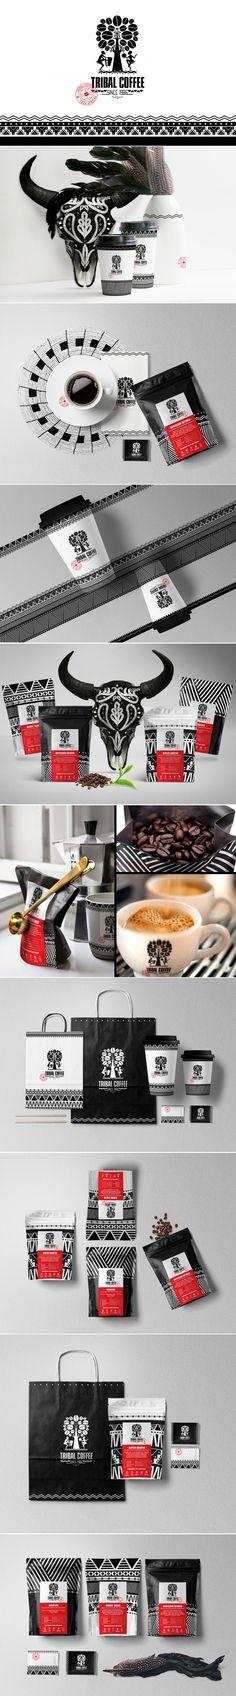 Tribal Coffee branding and packaging by olena fedorova graphic design studio Brand Identity Design, Graphic Design Branding, Corporate Design, Coffee Shop Branding, Coffee Packaging, Brand Packaging, Packaging Design, Letterhead Design, Branding Agency